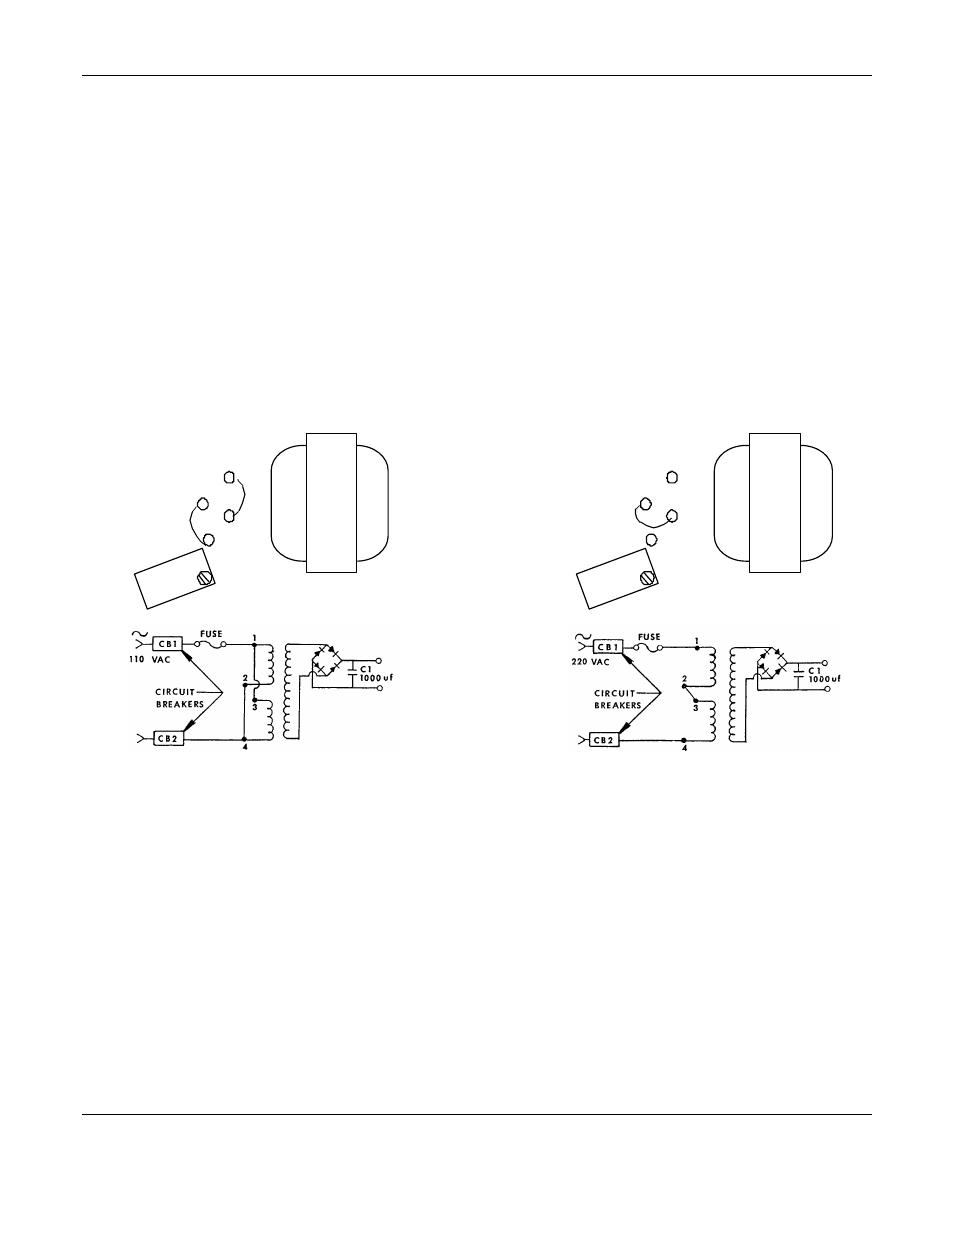 110 V Wiring 220 Enmet Isa 40m User Manual Page Vac 6 18